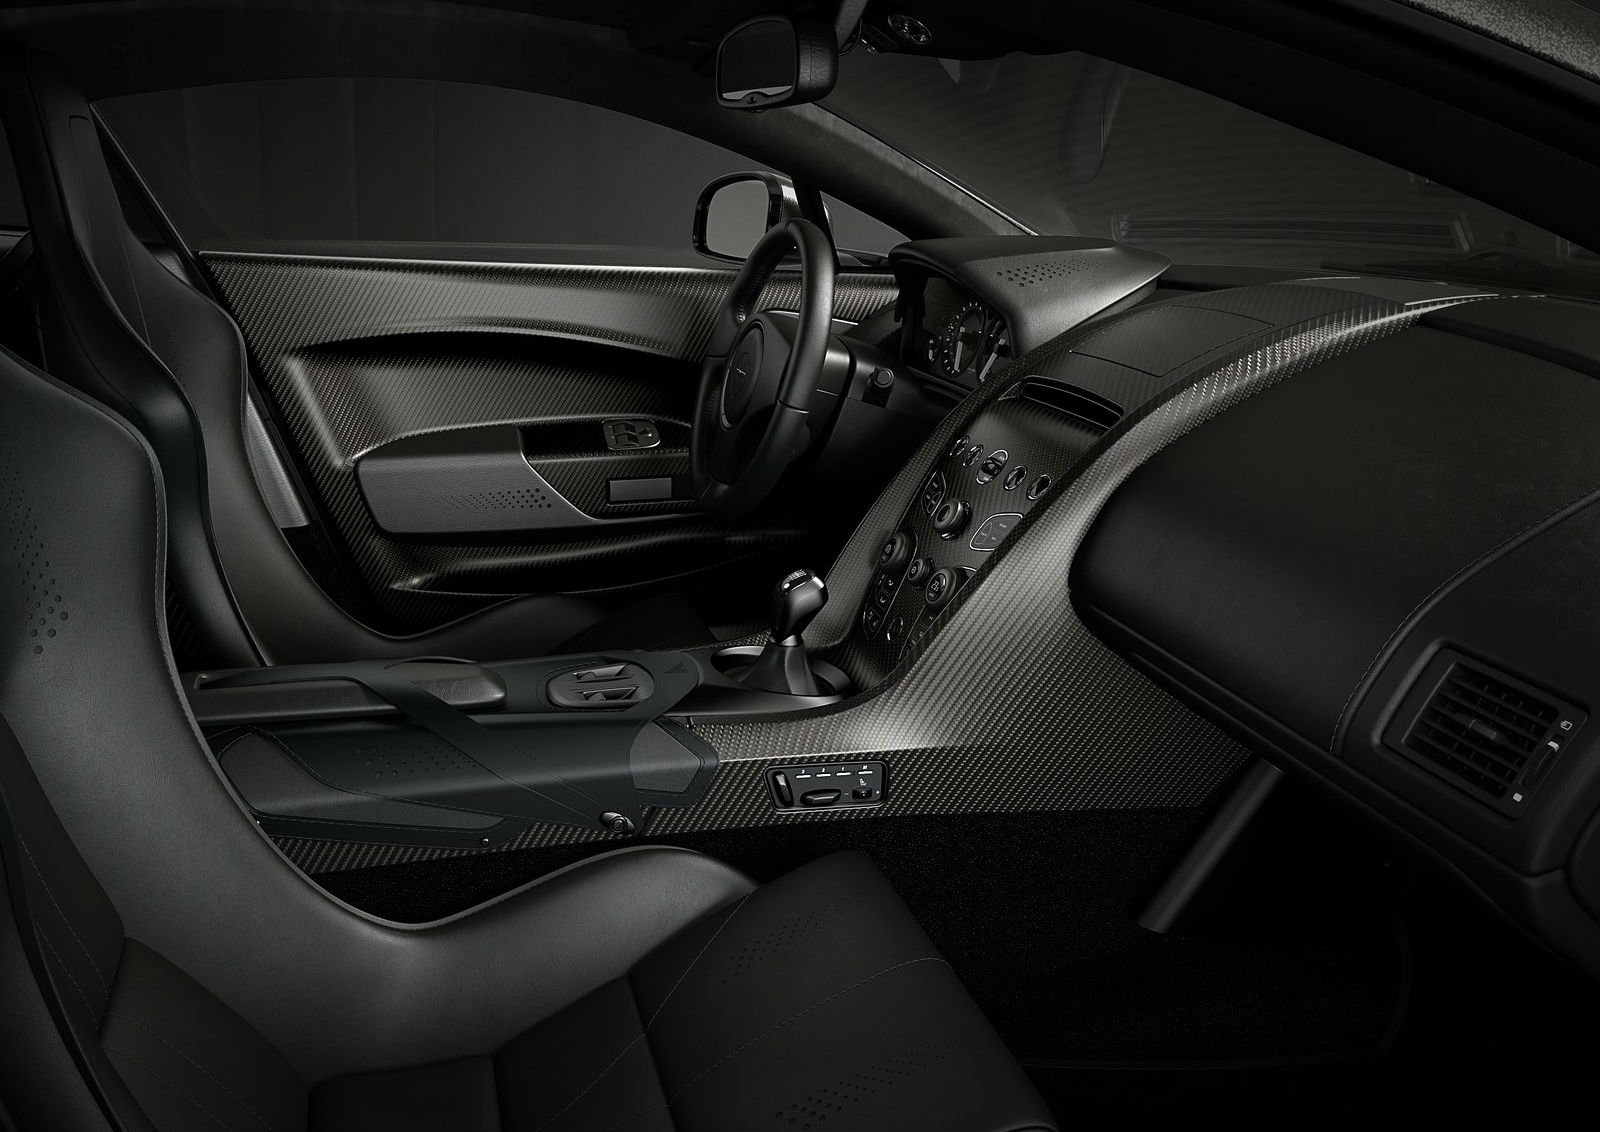 Aston Martin V12 Vantage V600 2018